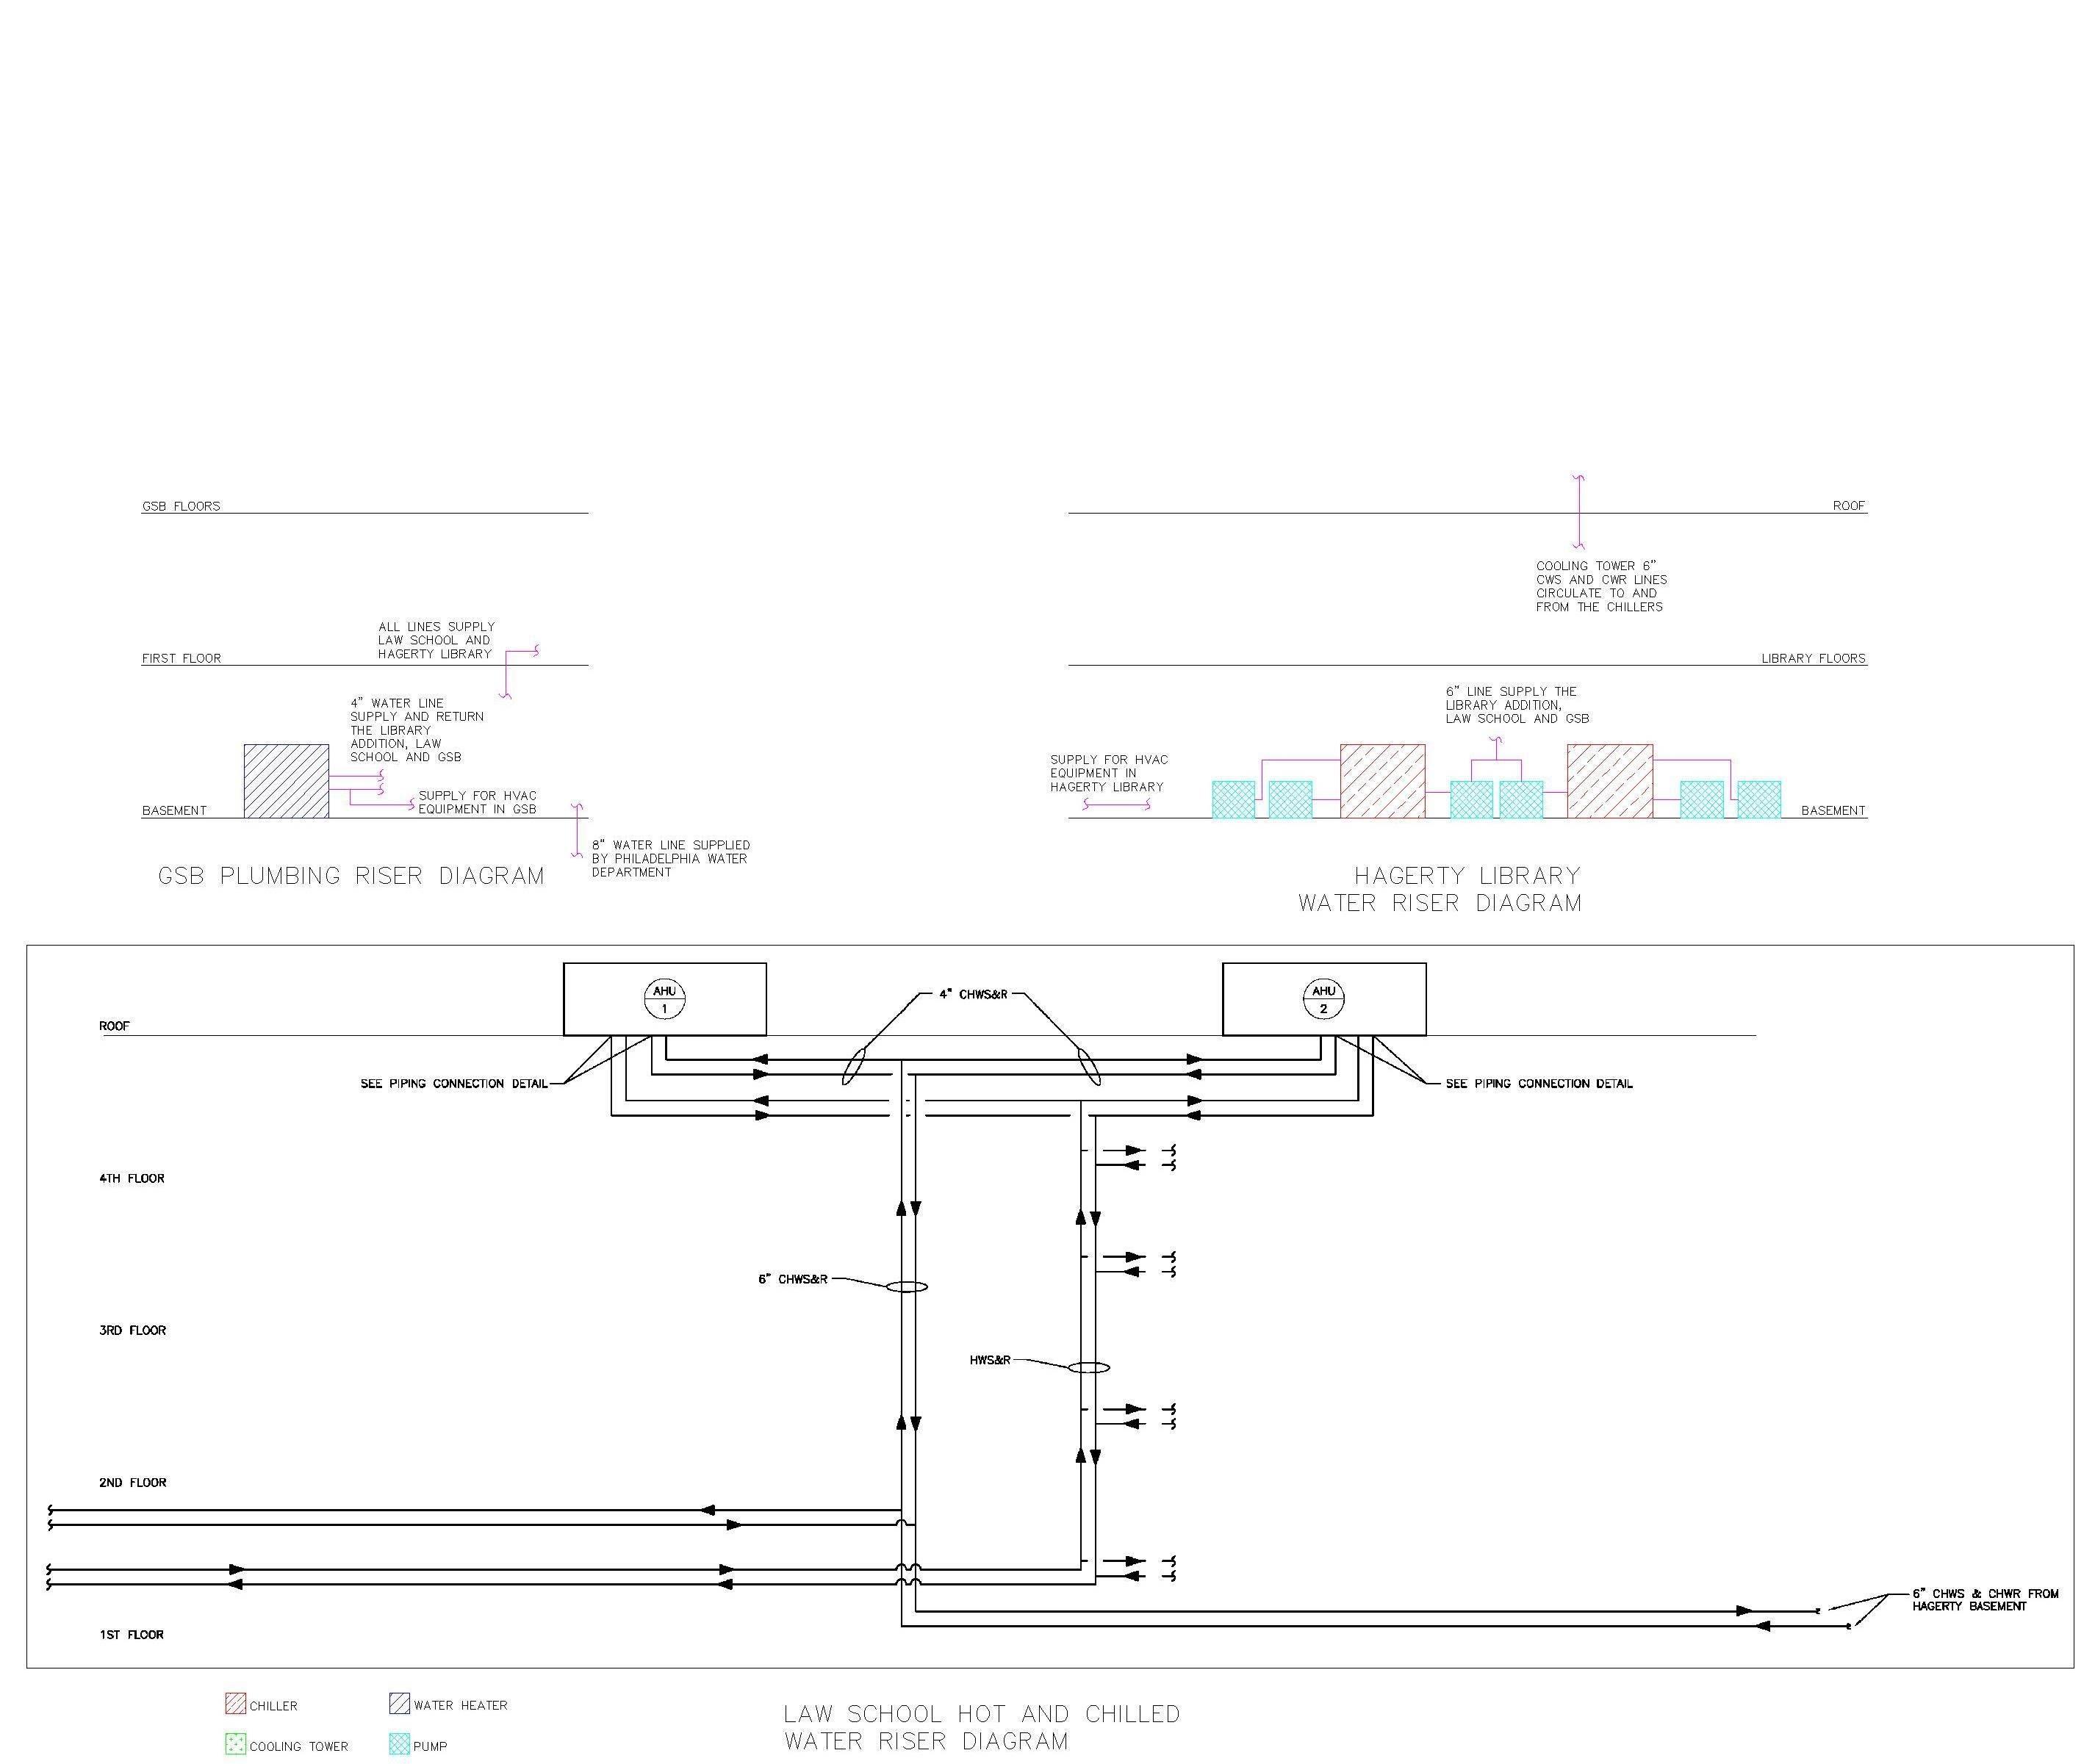 plumbing sanitary riser diagram engine wiring diagrams singlelinediagram2 ae390final